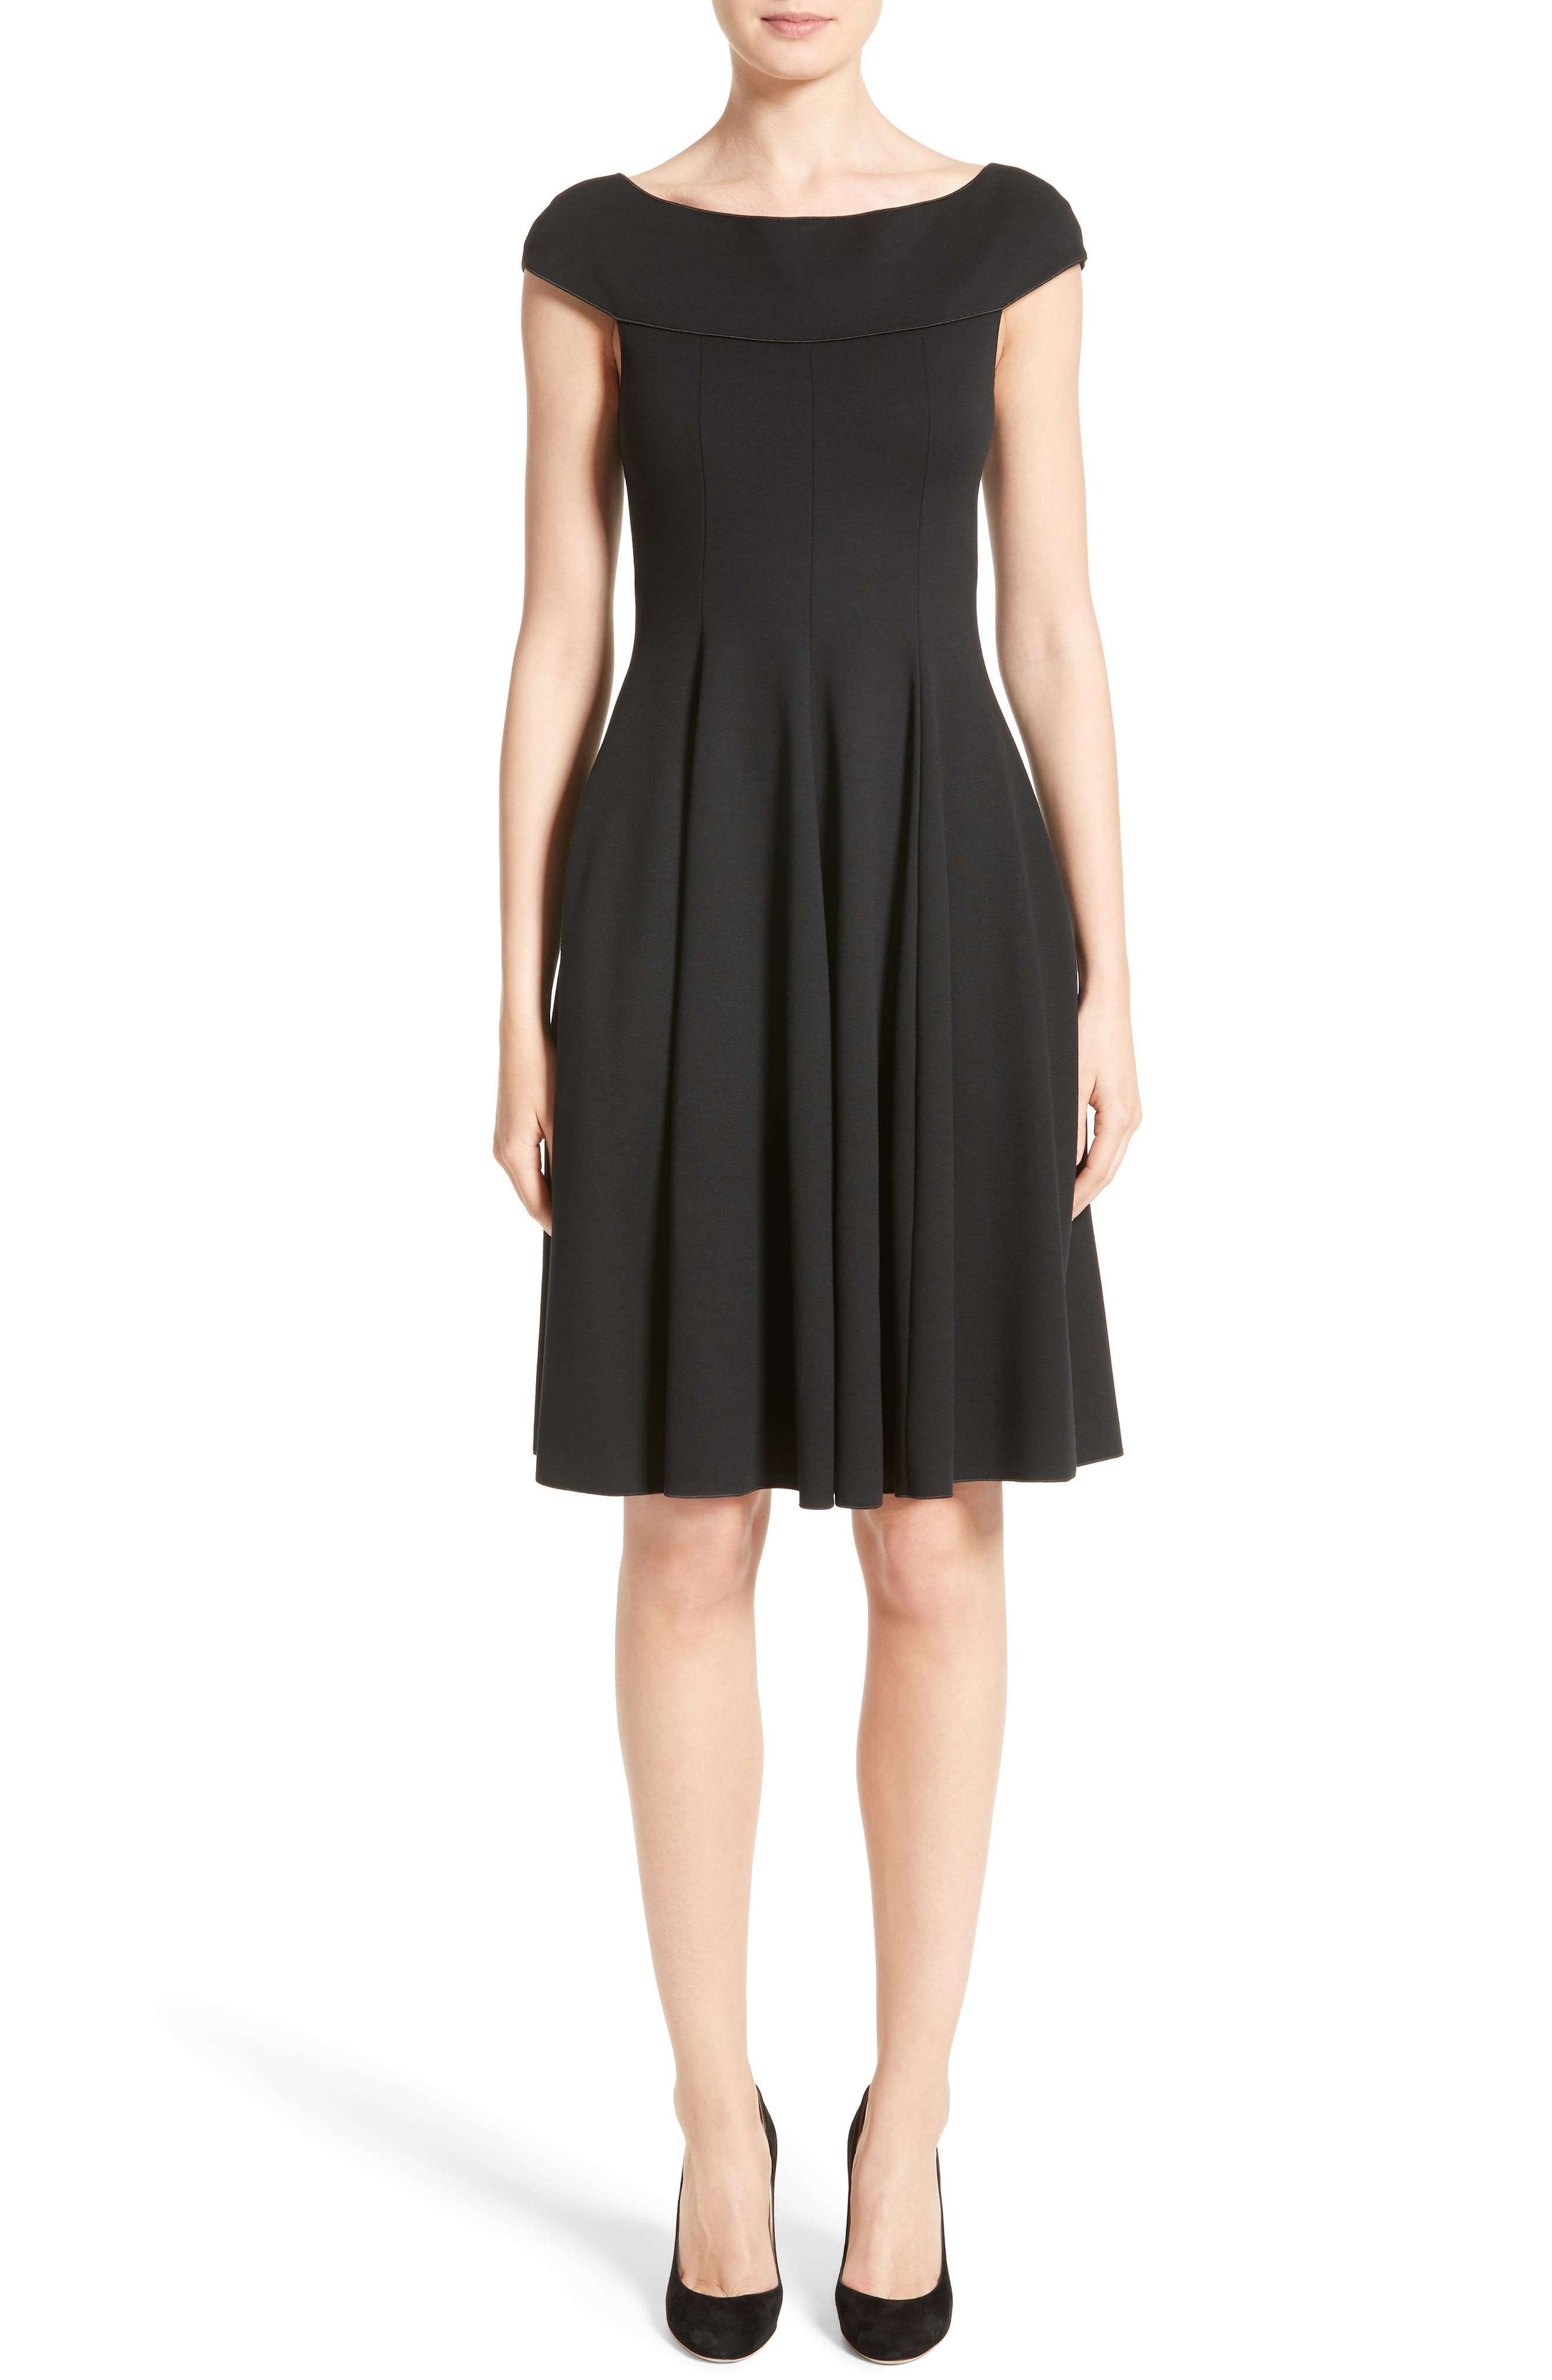 Main Image - Armani Collezioni Off the Shoulder Fit & Flare Dress